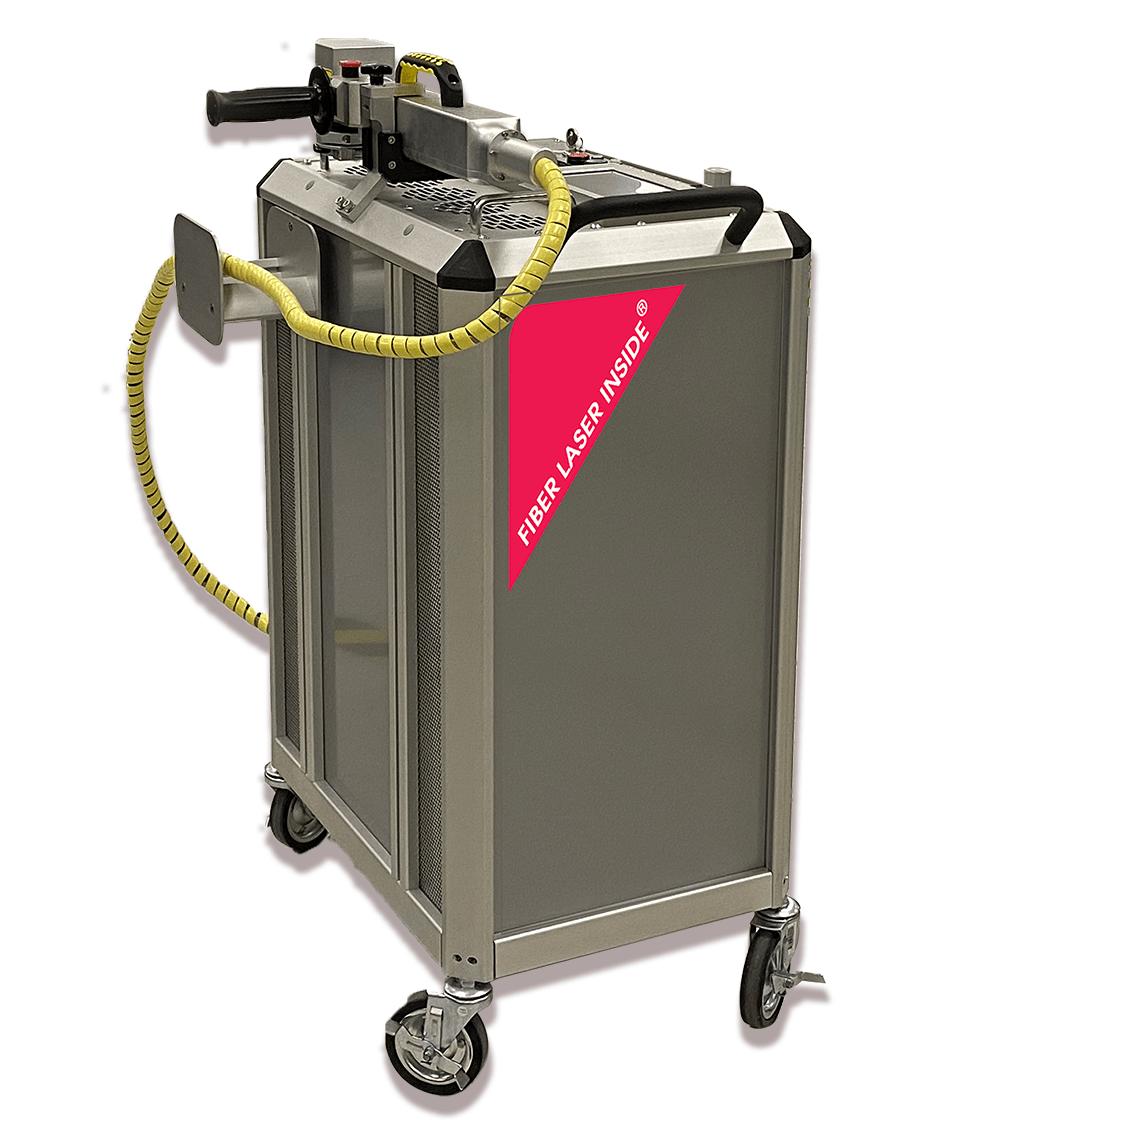 CleanTech Handheld-LPC-200CTH